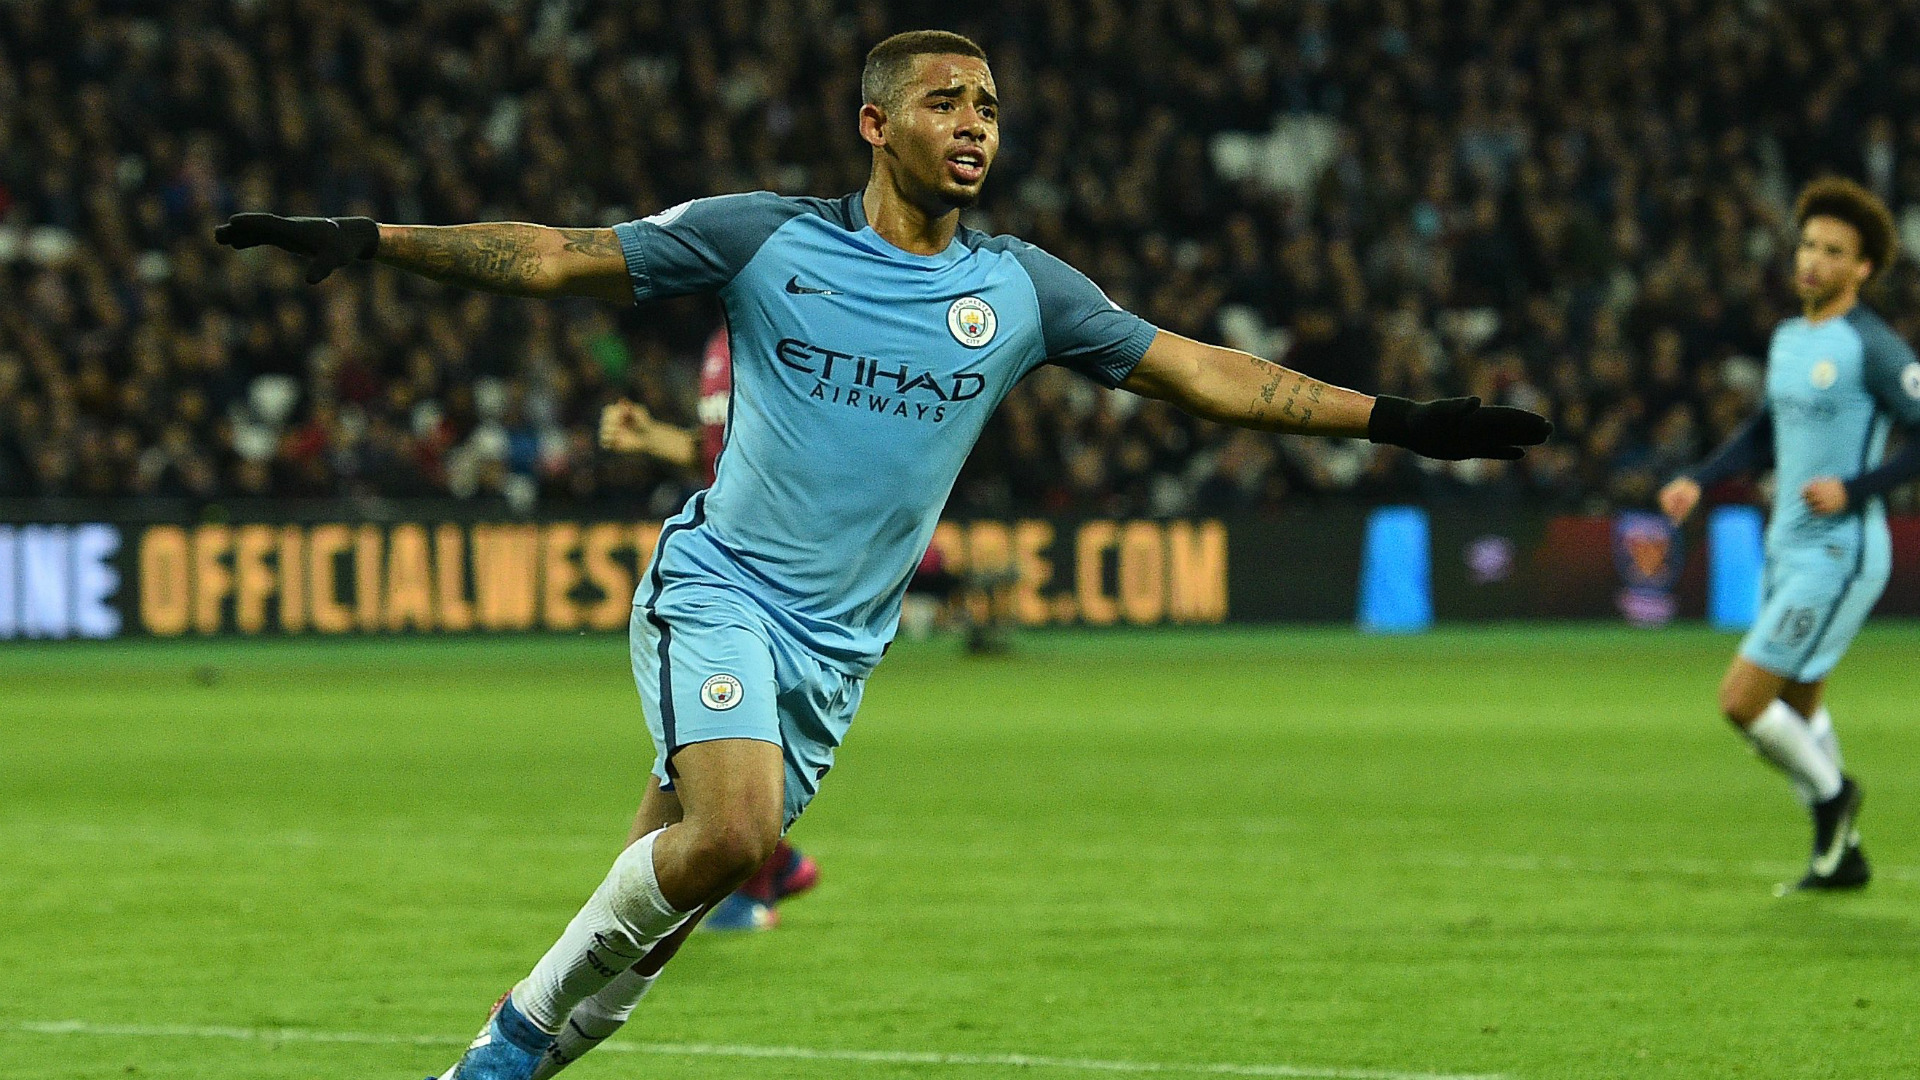 tim Manchester CIty Football &quot;width =&quot; 681 &quot;height =&quot; 383 &quot;/&gt; </p> <p style=